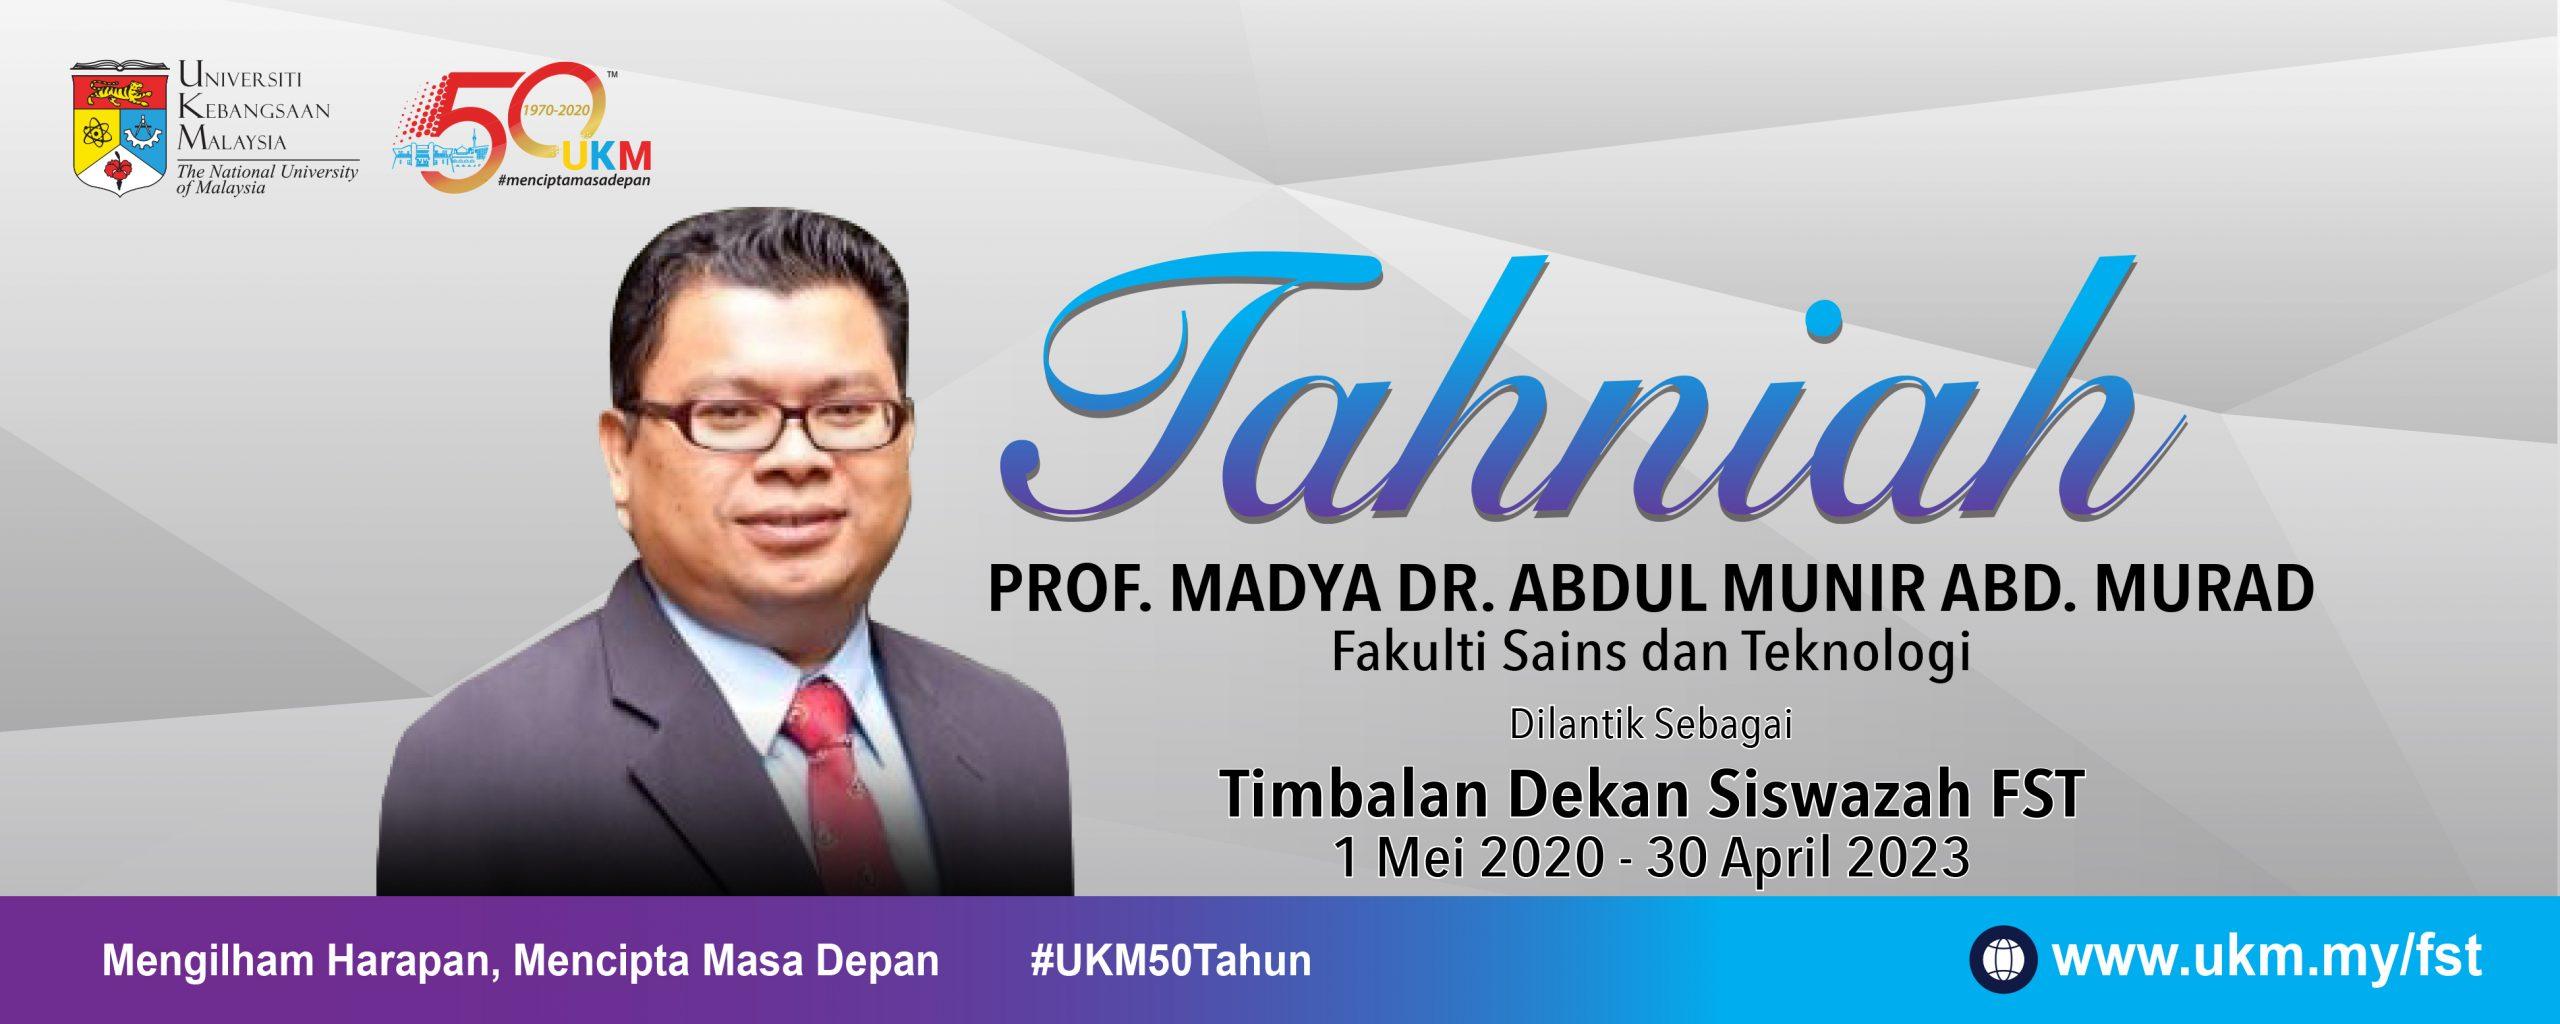 Tahniah YBrs. Prof. Madya Dr. Abdul Munir Abd. Murad